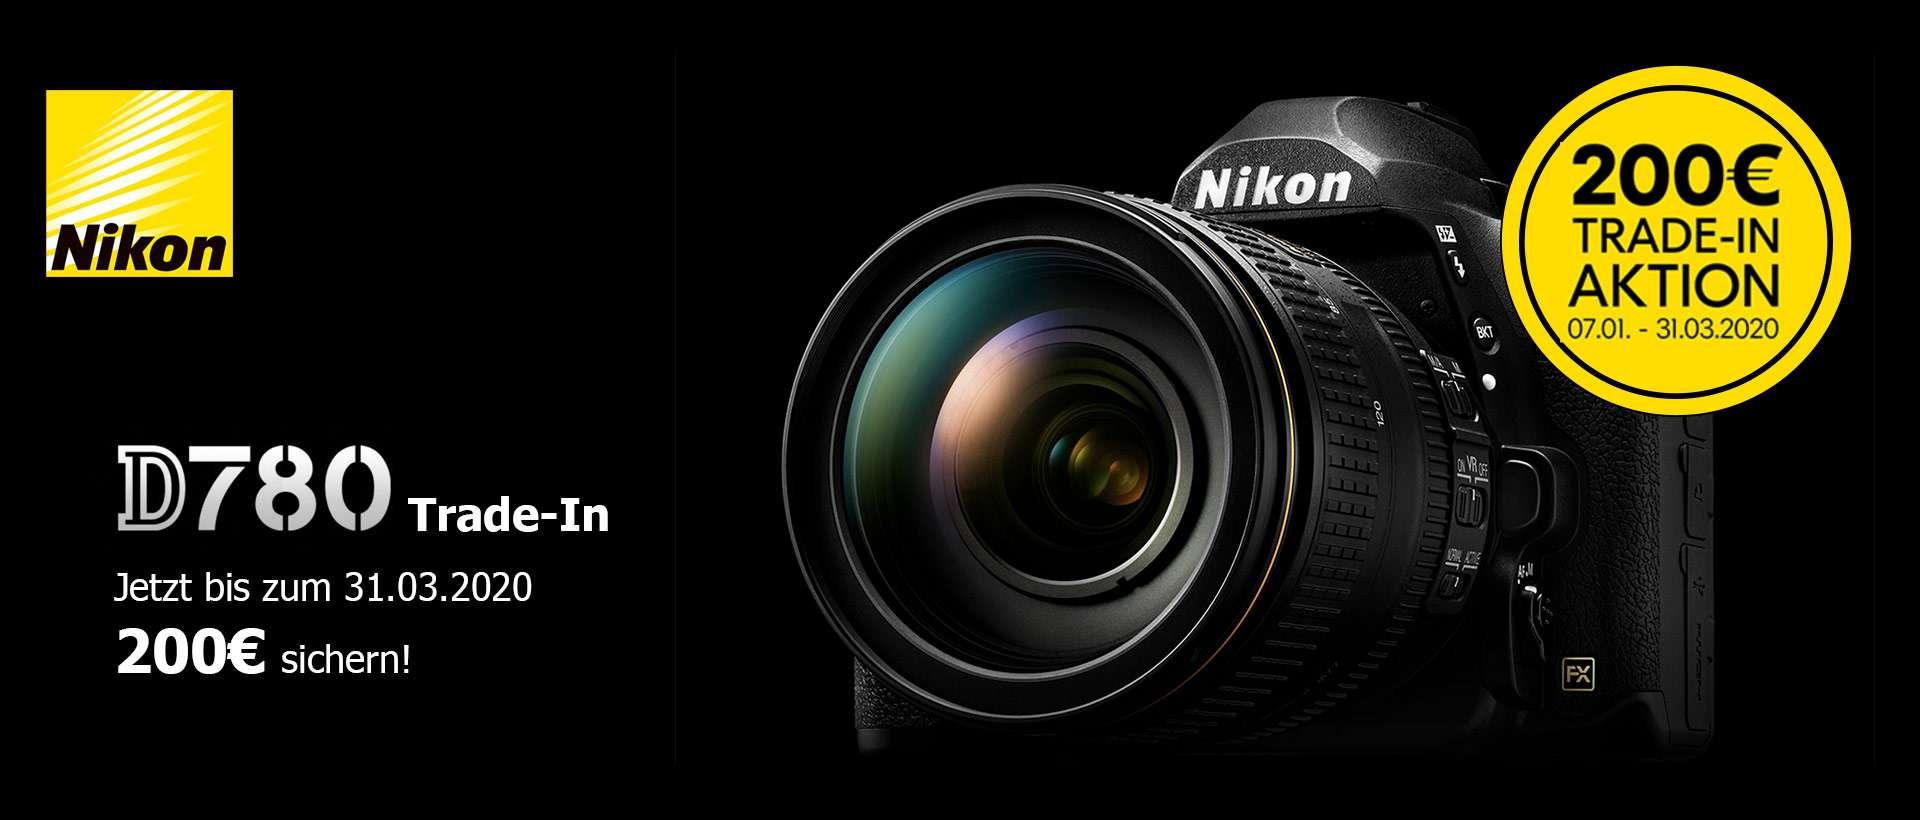 Nikon D780 Trade-In Aktion